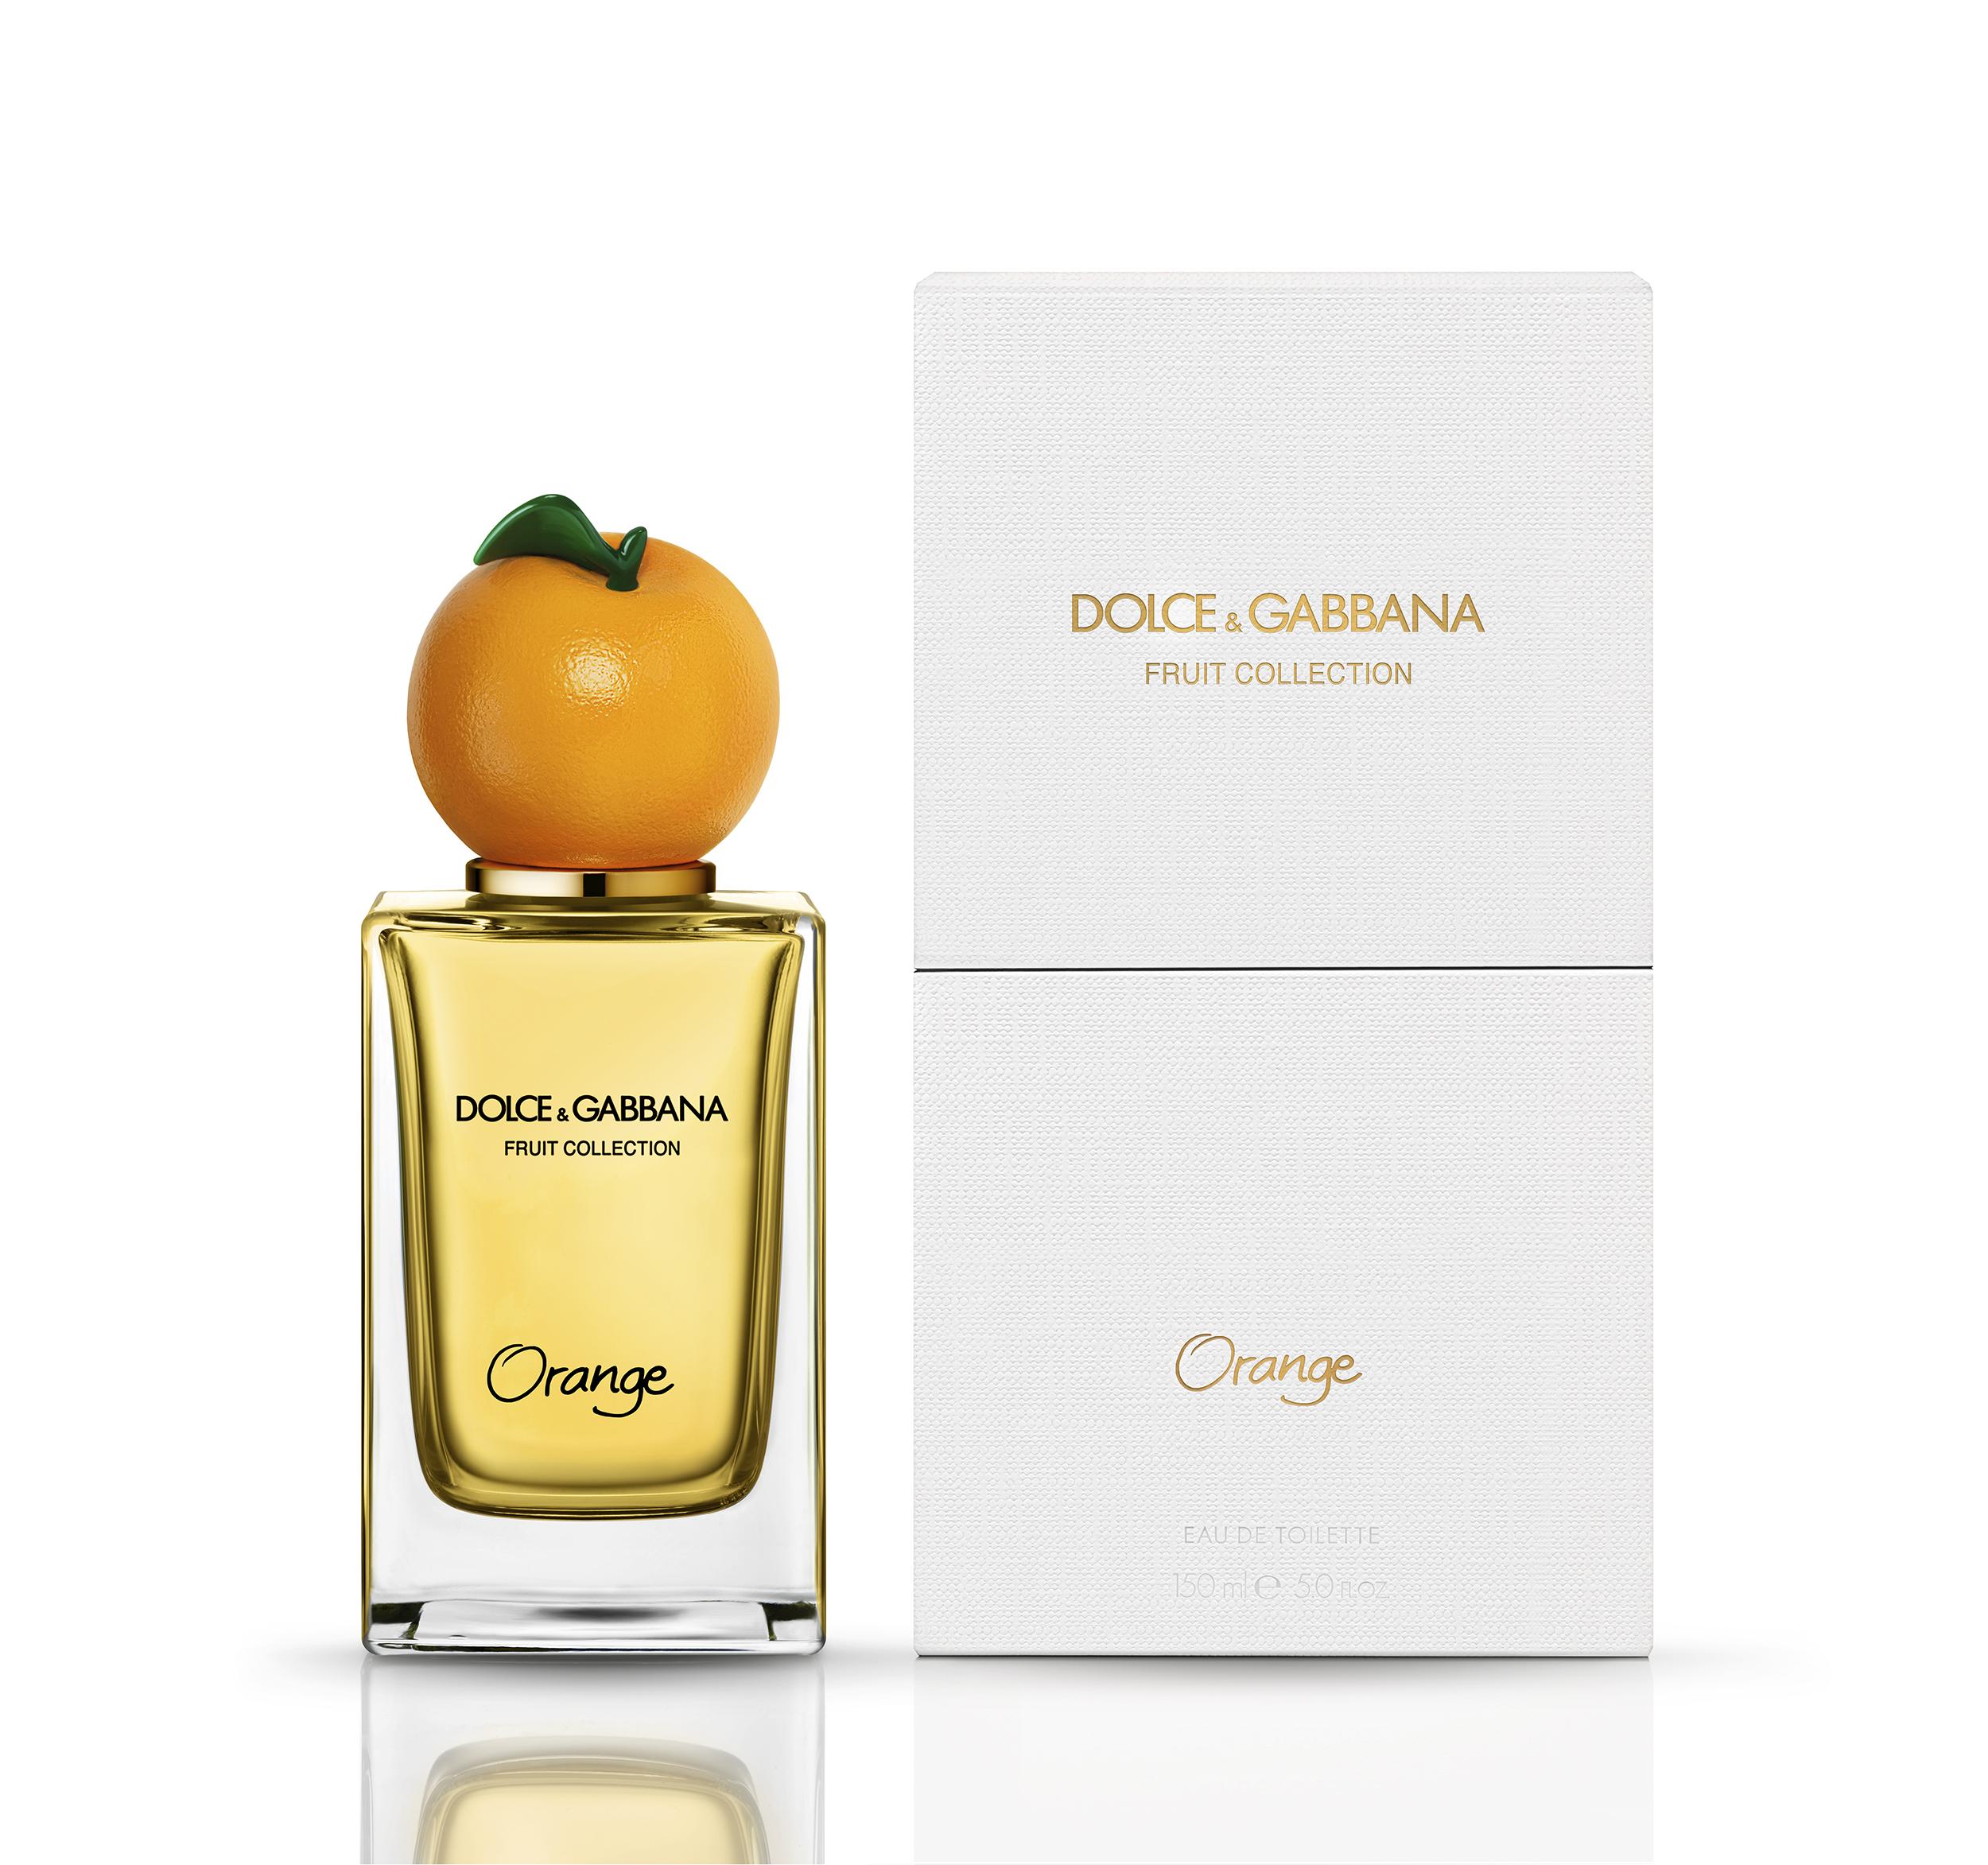 Парфюмерная коллекция Dolce & Gabbana